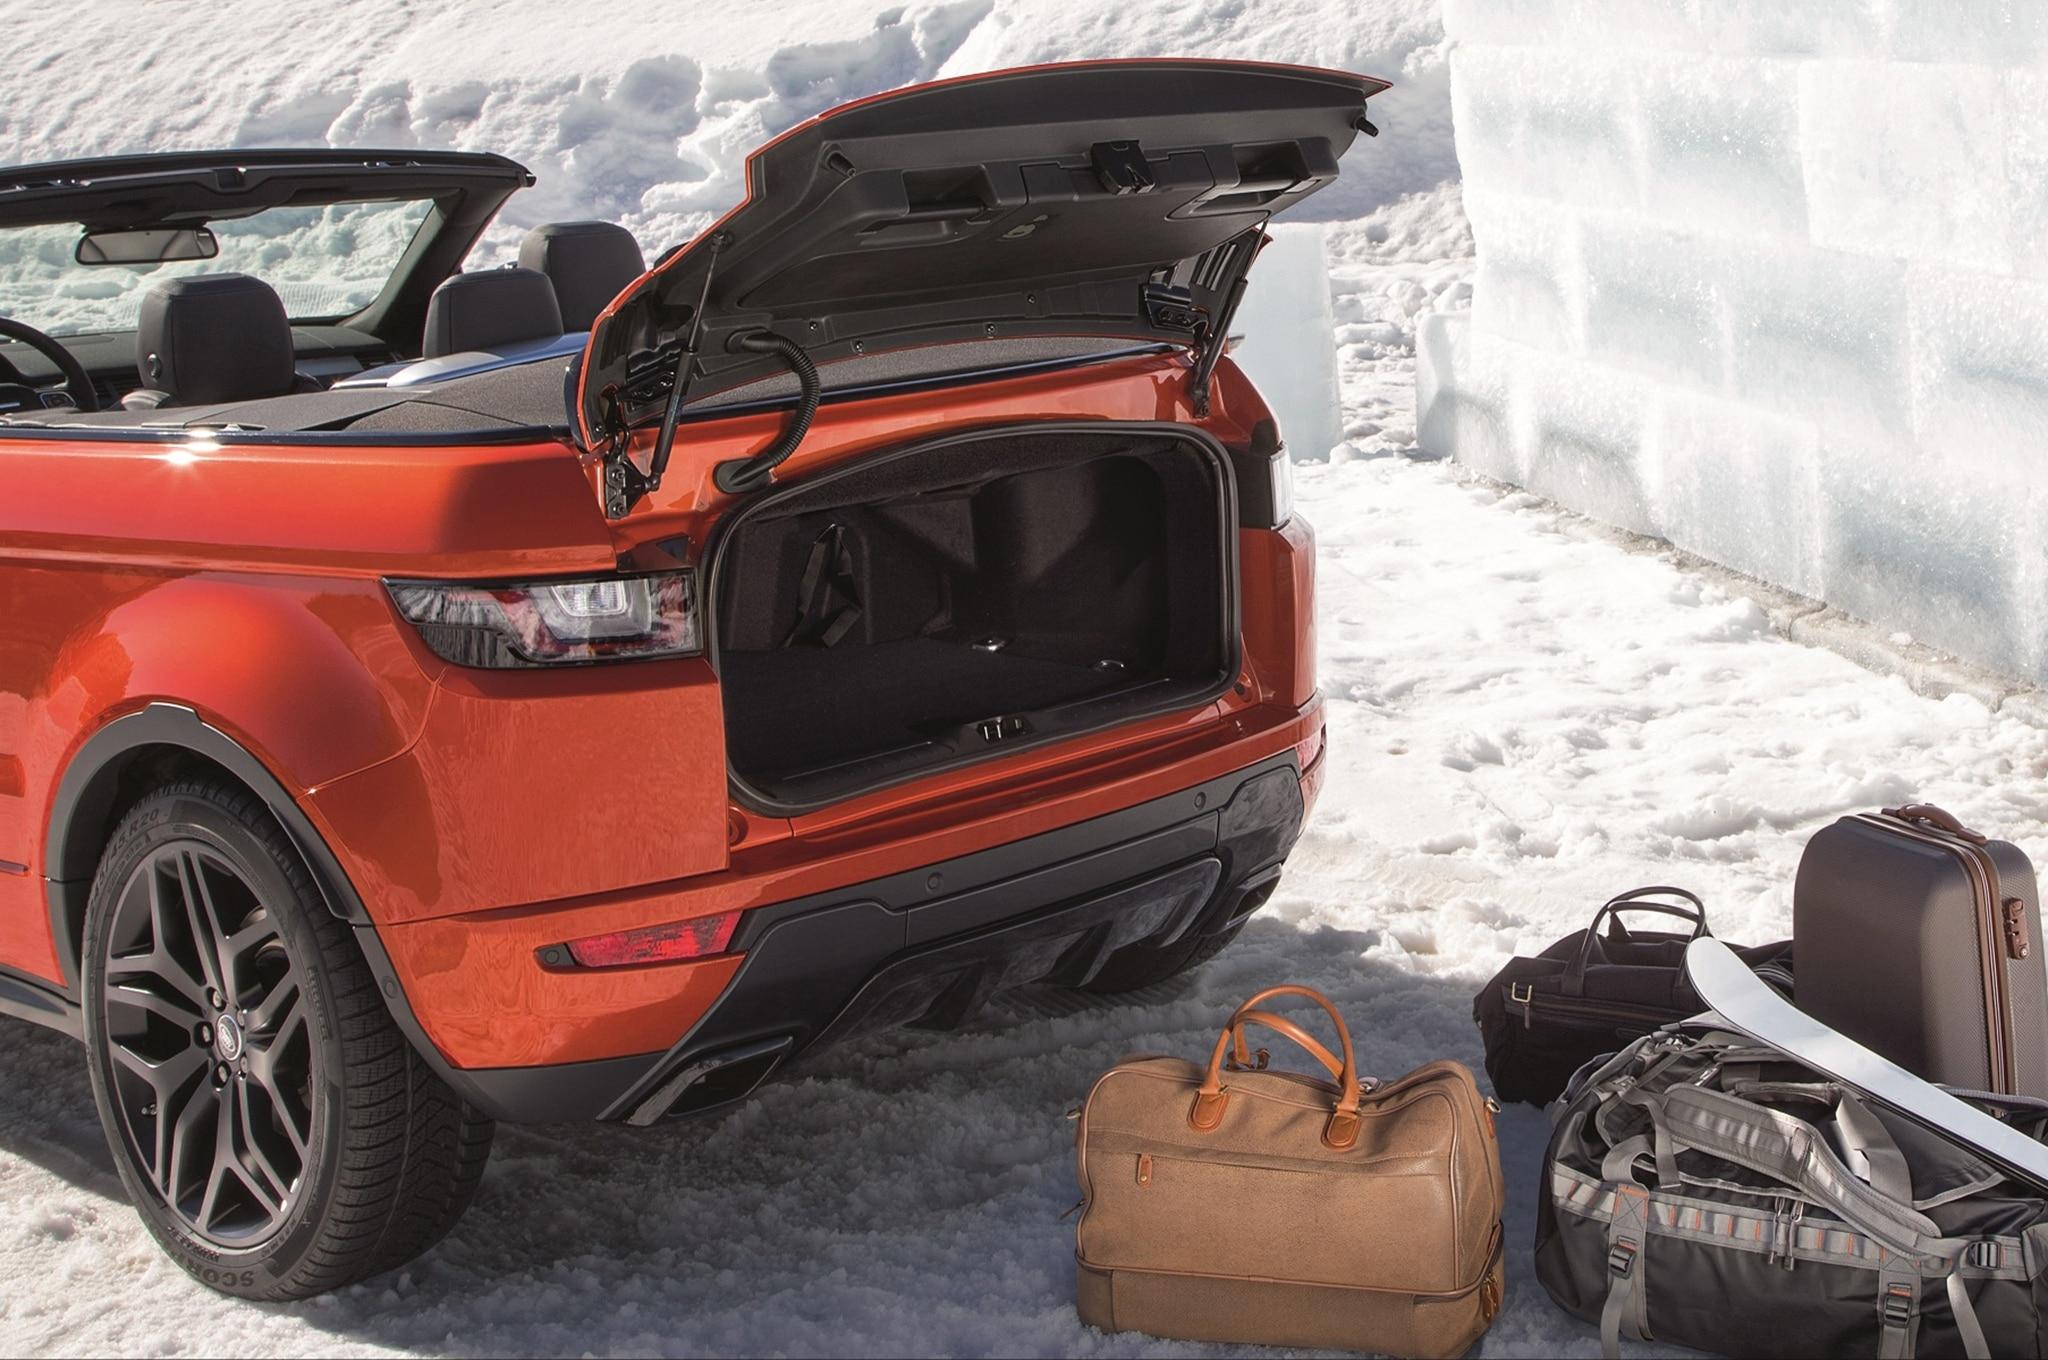 https://st.automobilemag.com/uploads/sites/11/2015/11/2017-Land-Rover-Range-Rover-Evoque-convertible-trunk-3.jpg